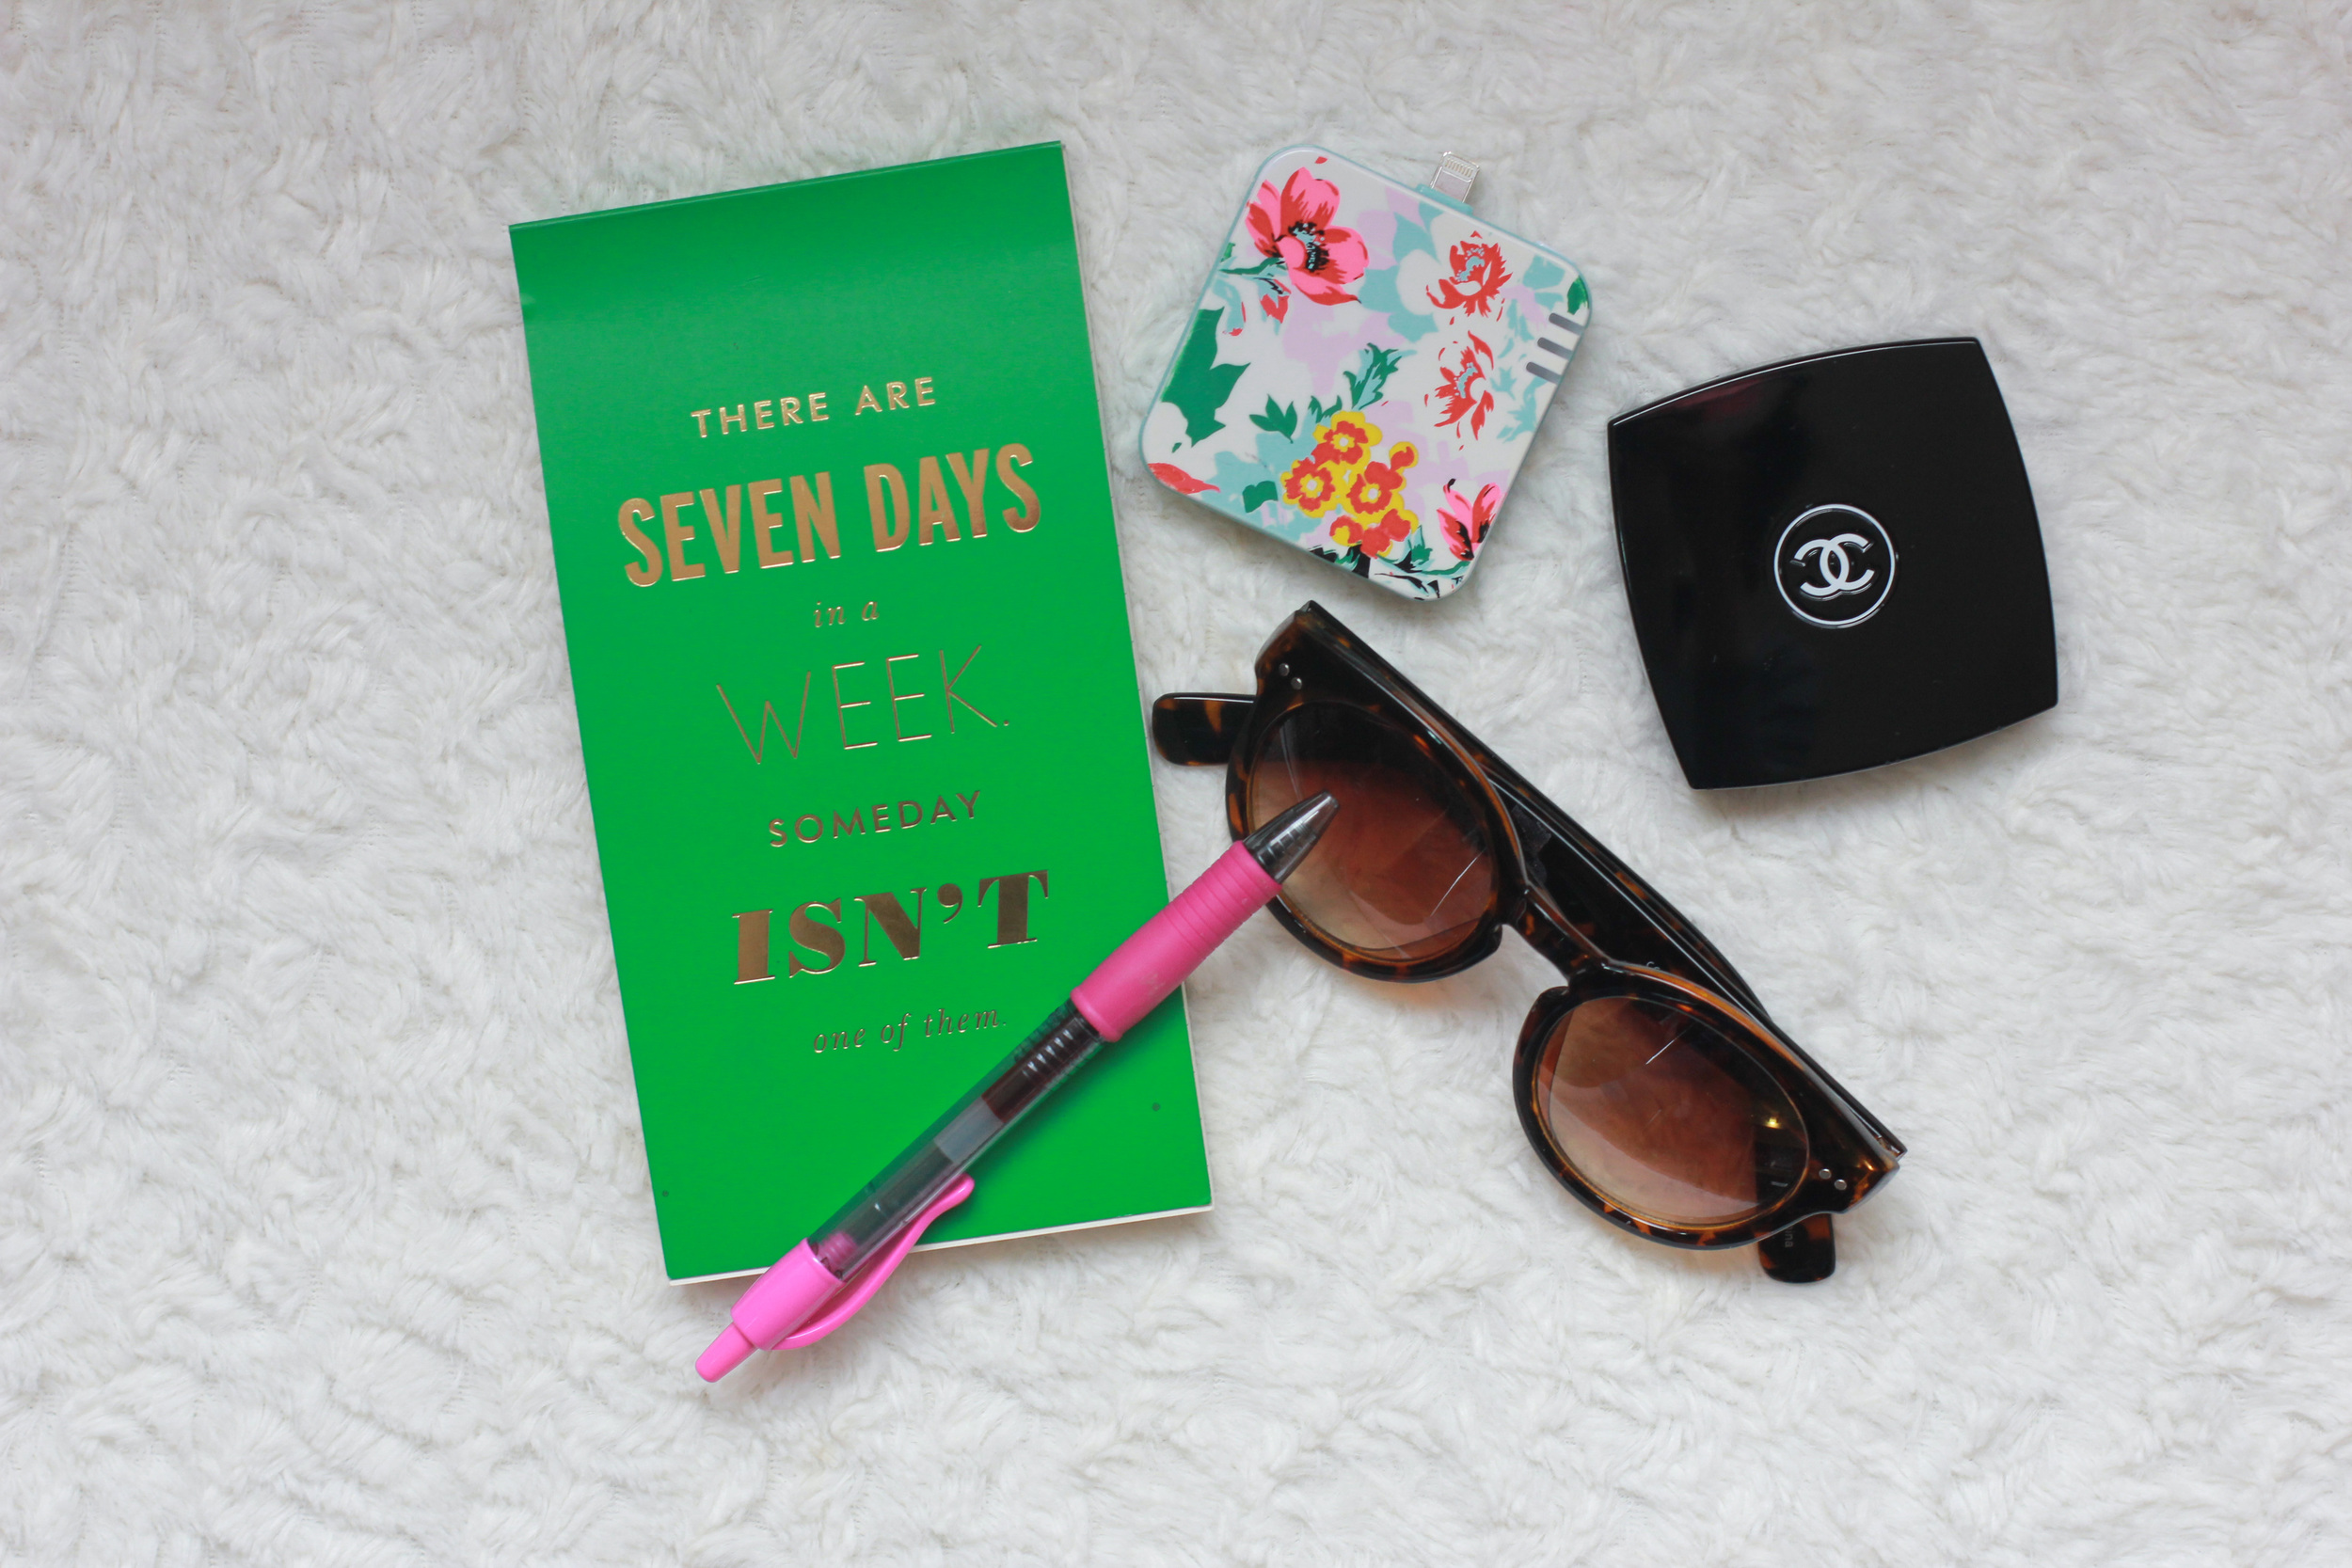 Kate Spade Cedar Street Maise - chanel powder compact, kate spade notebook, kate spade fabric wristlet, ban.do florabunda charger, LOFT sunglasses,